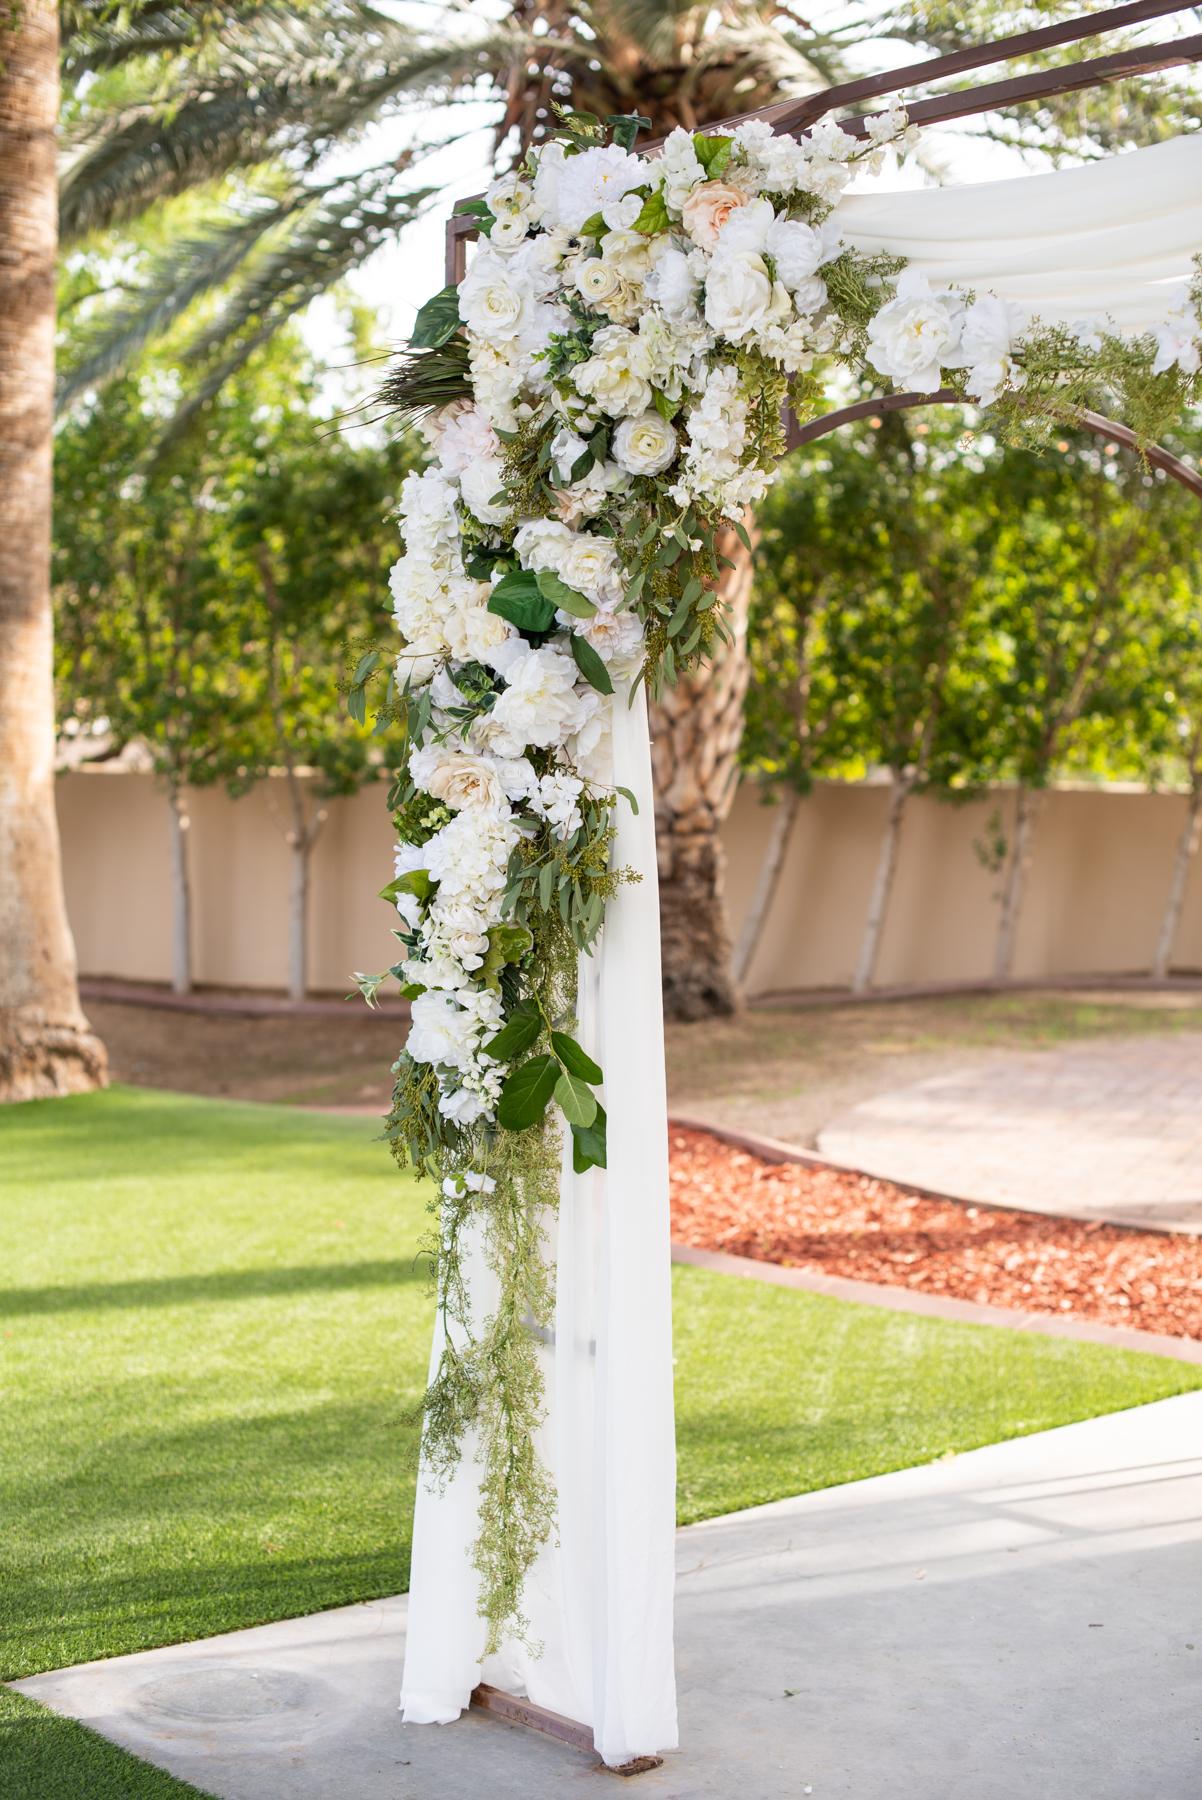 Secret Garden Event Center Wedding - Meredith Amadee Photography-59.jpg